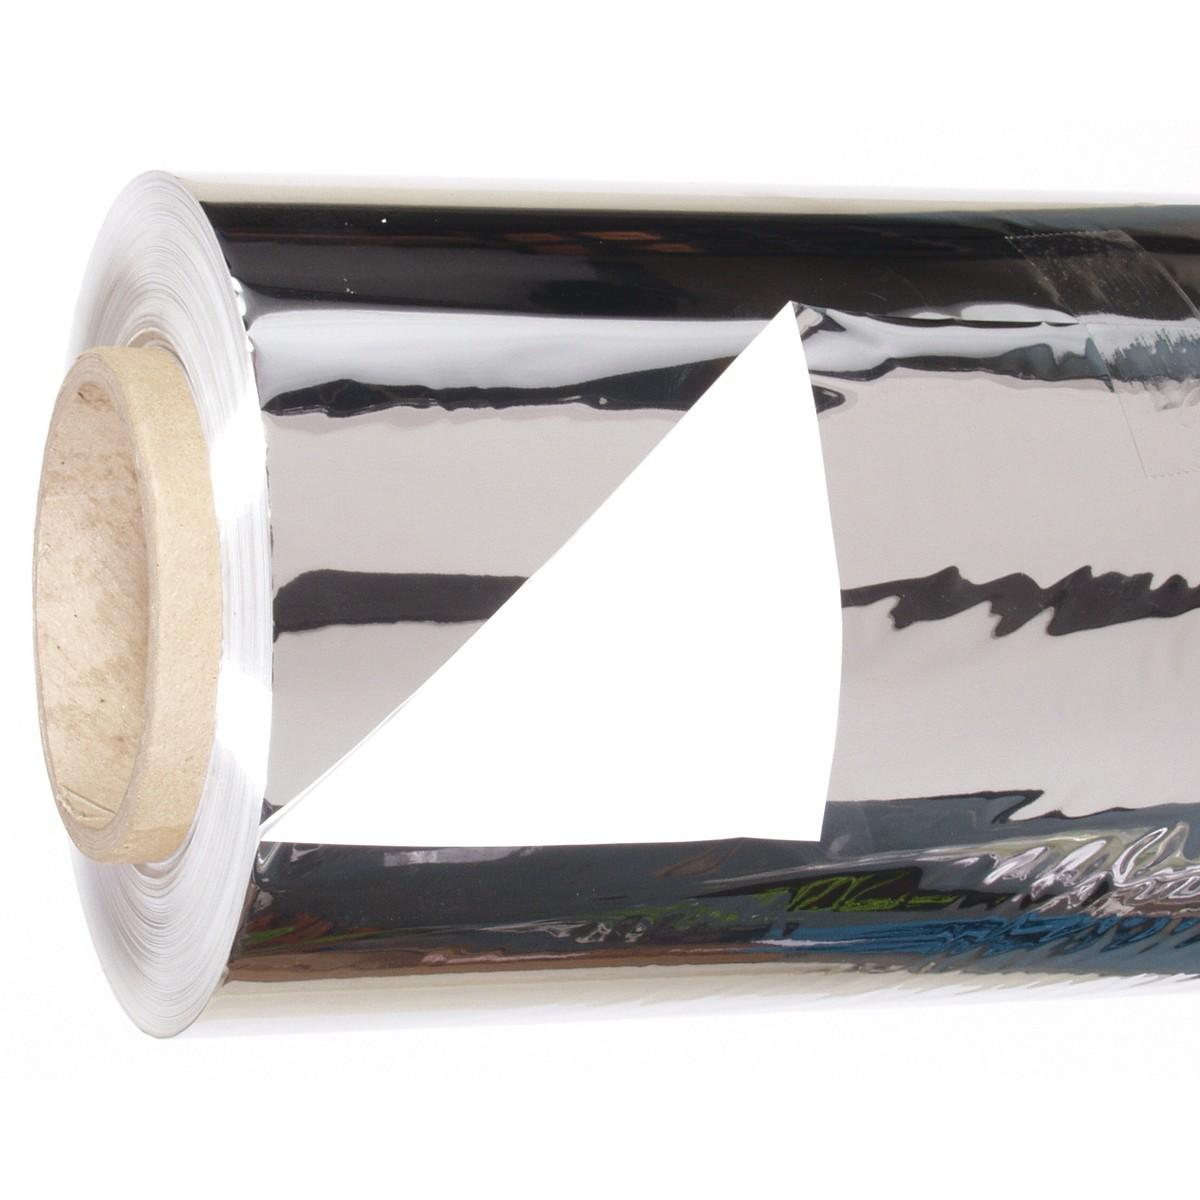 Mylar reflective material